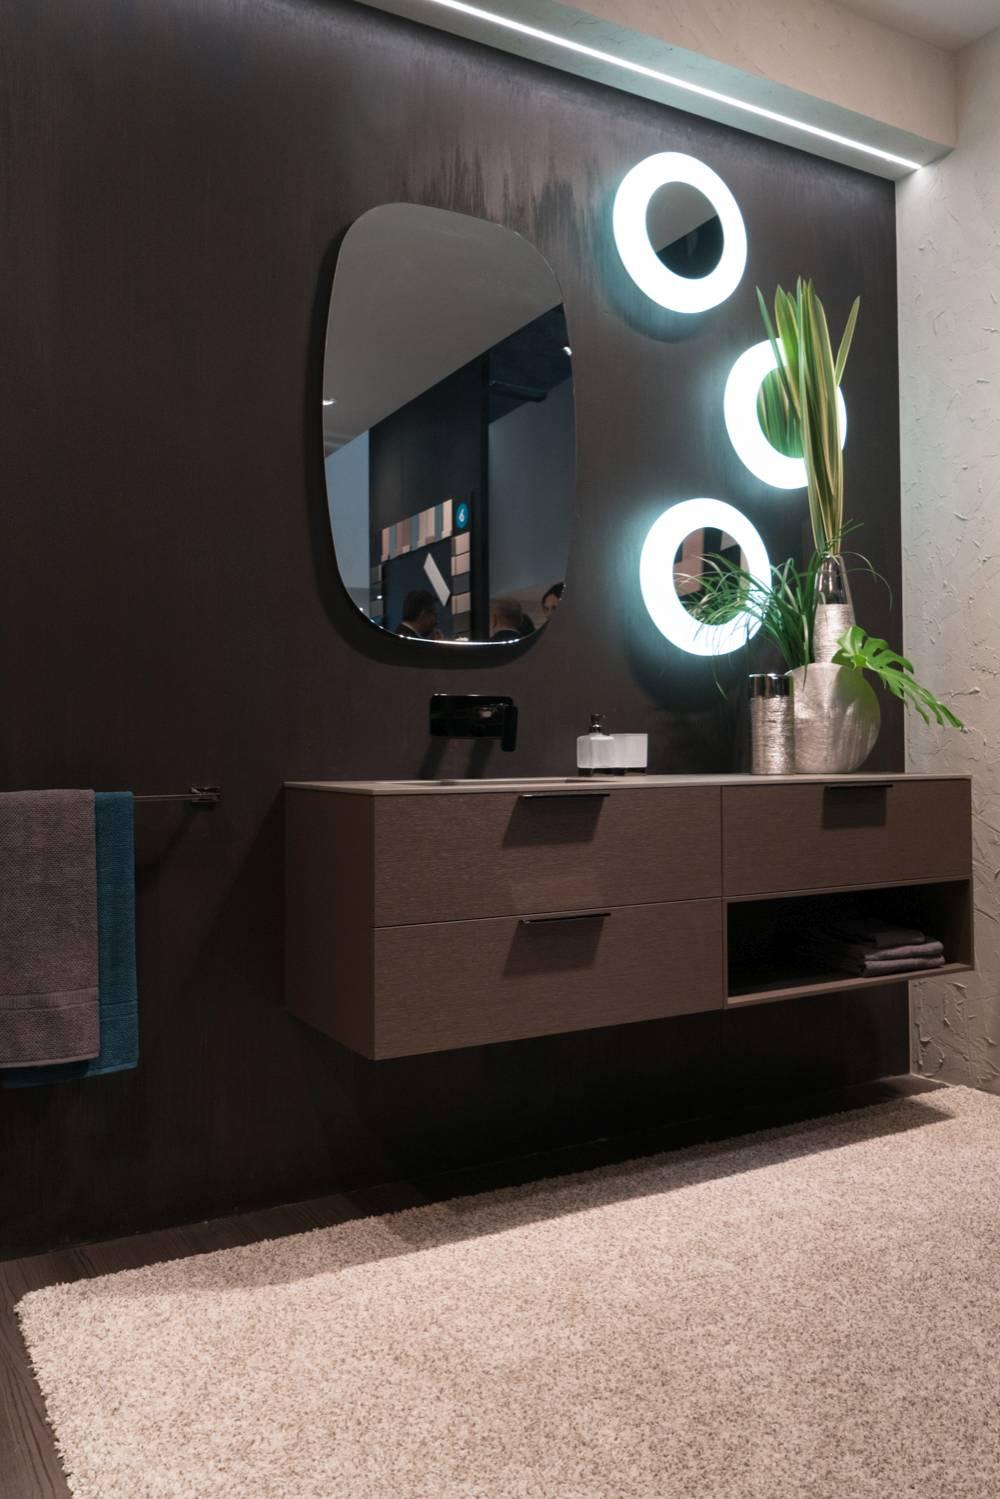 Fancy round bathroom led light mirrors